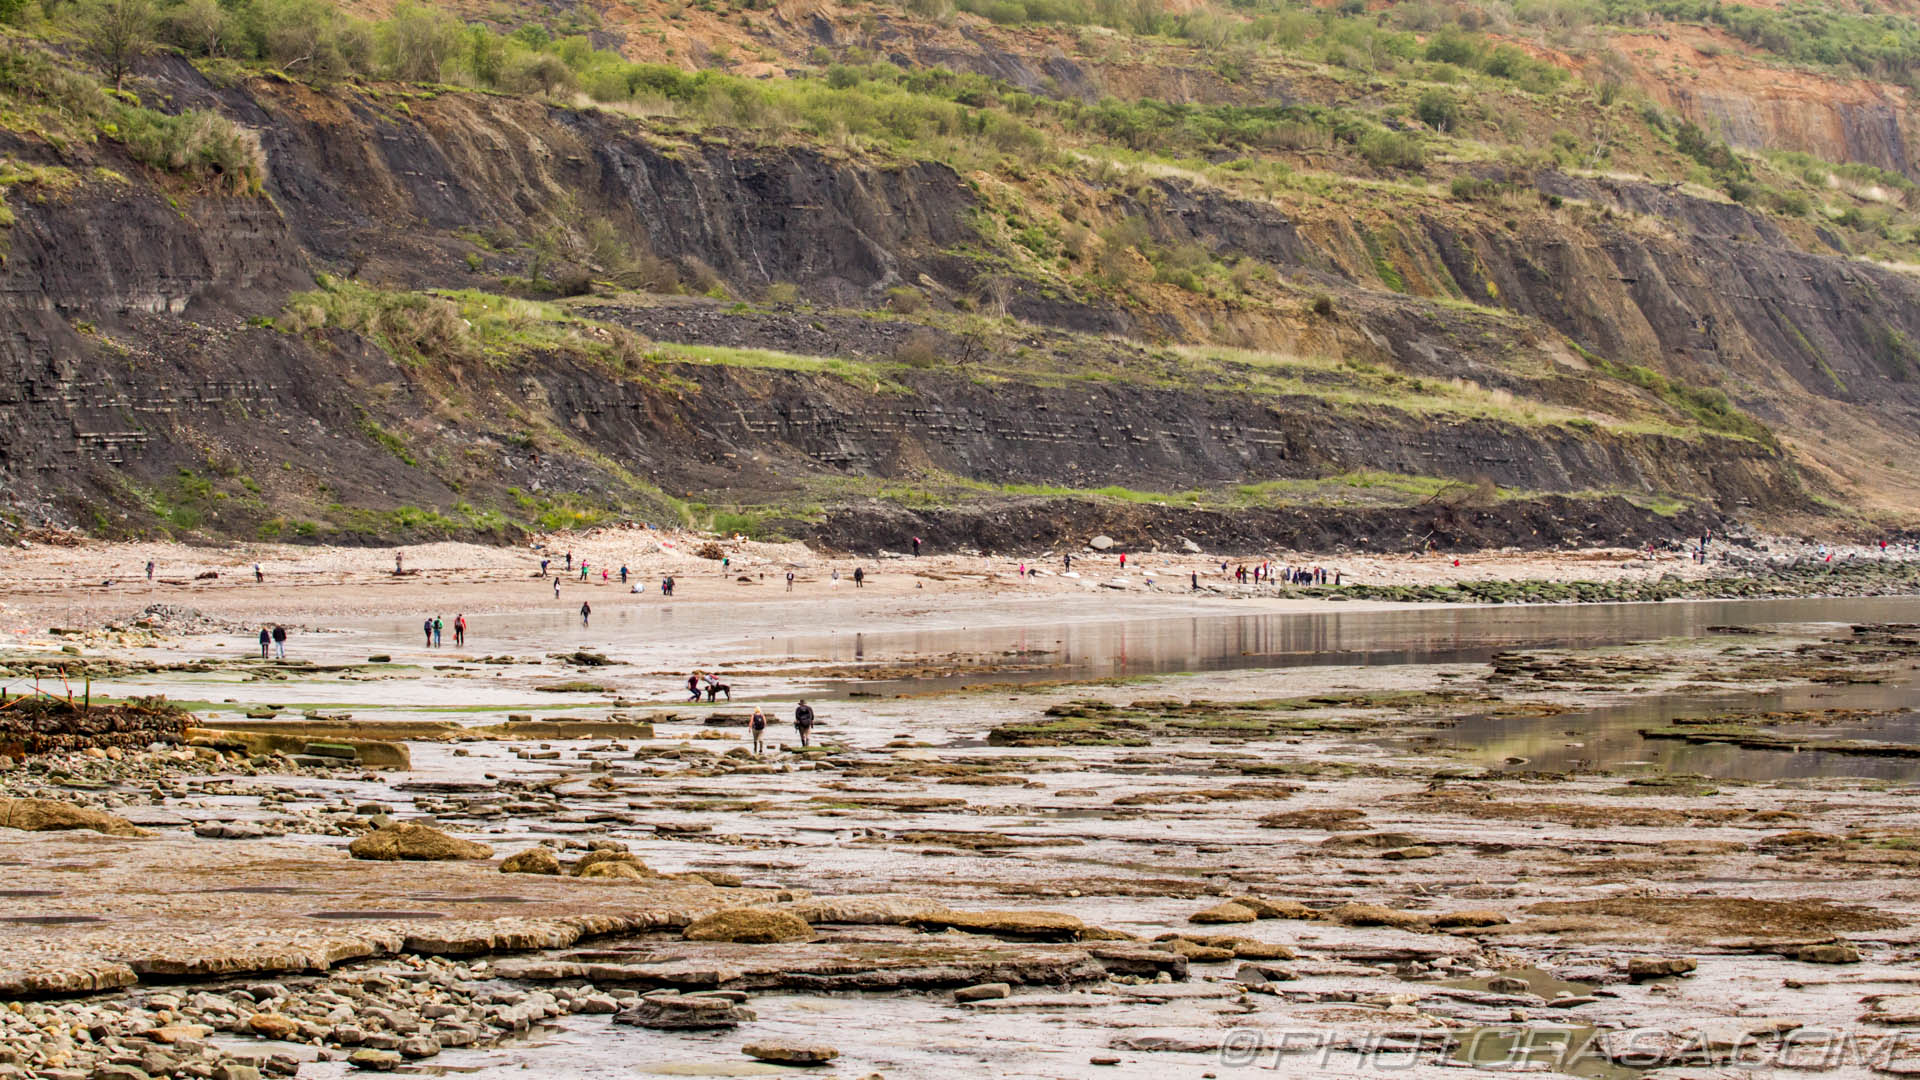 https://photorasa.com/jurassic-coast-lyme-regis/people-looking-for-fossils-at-the-jurassic-cliffs-of-dorset/